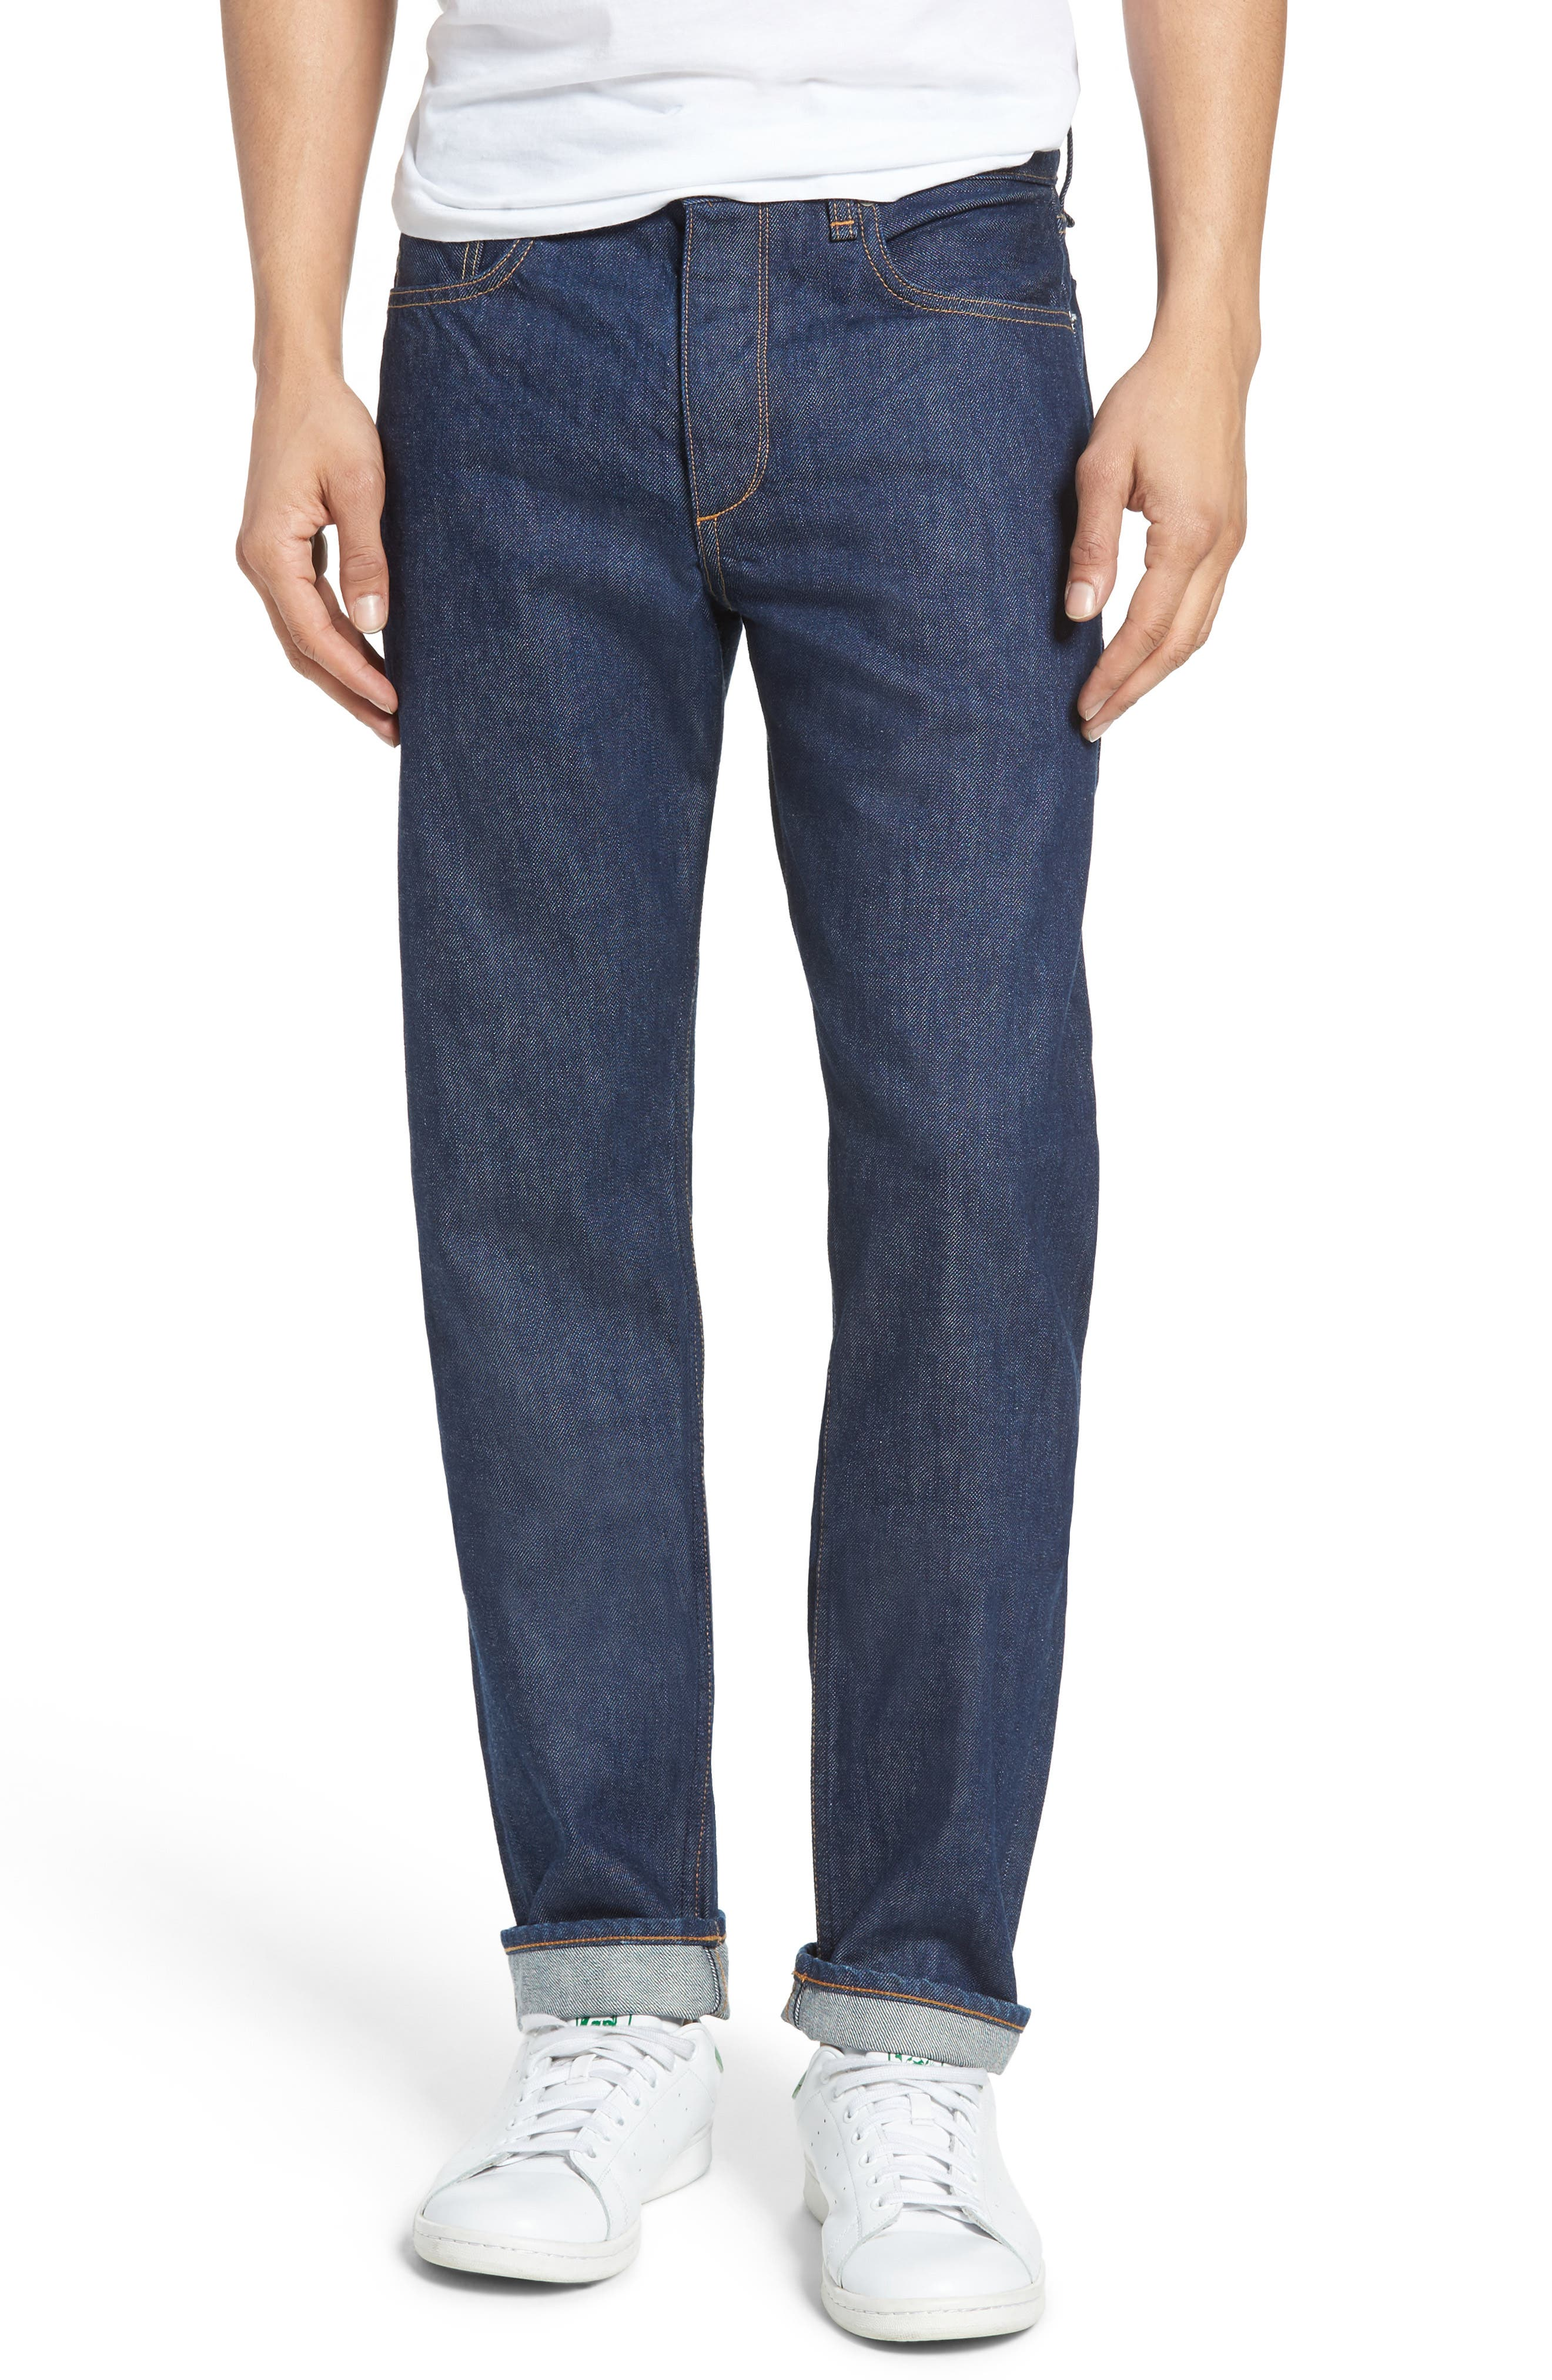 Main Image - rag & bone Fit 2 Slim Fit Selvedge Jeans (Summer Selvedge)